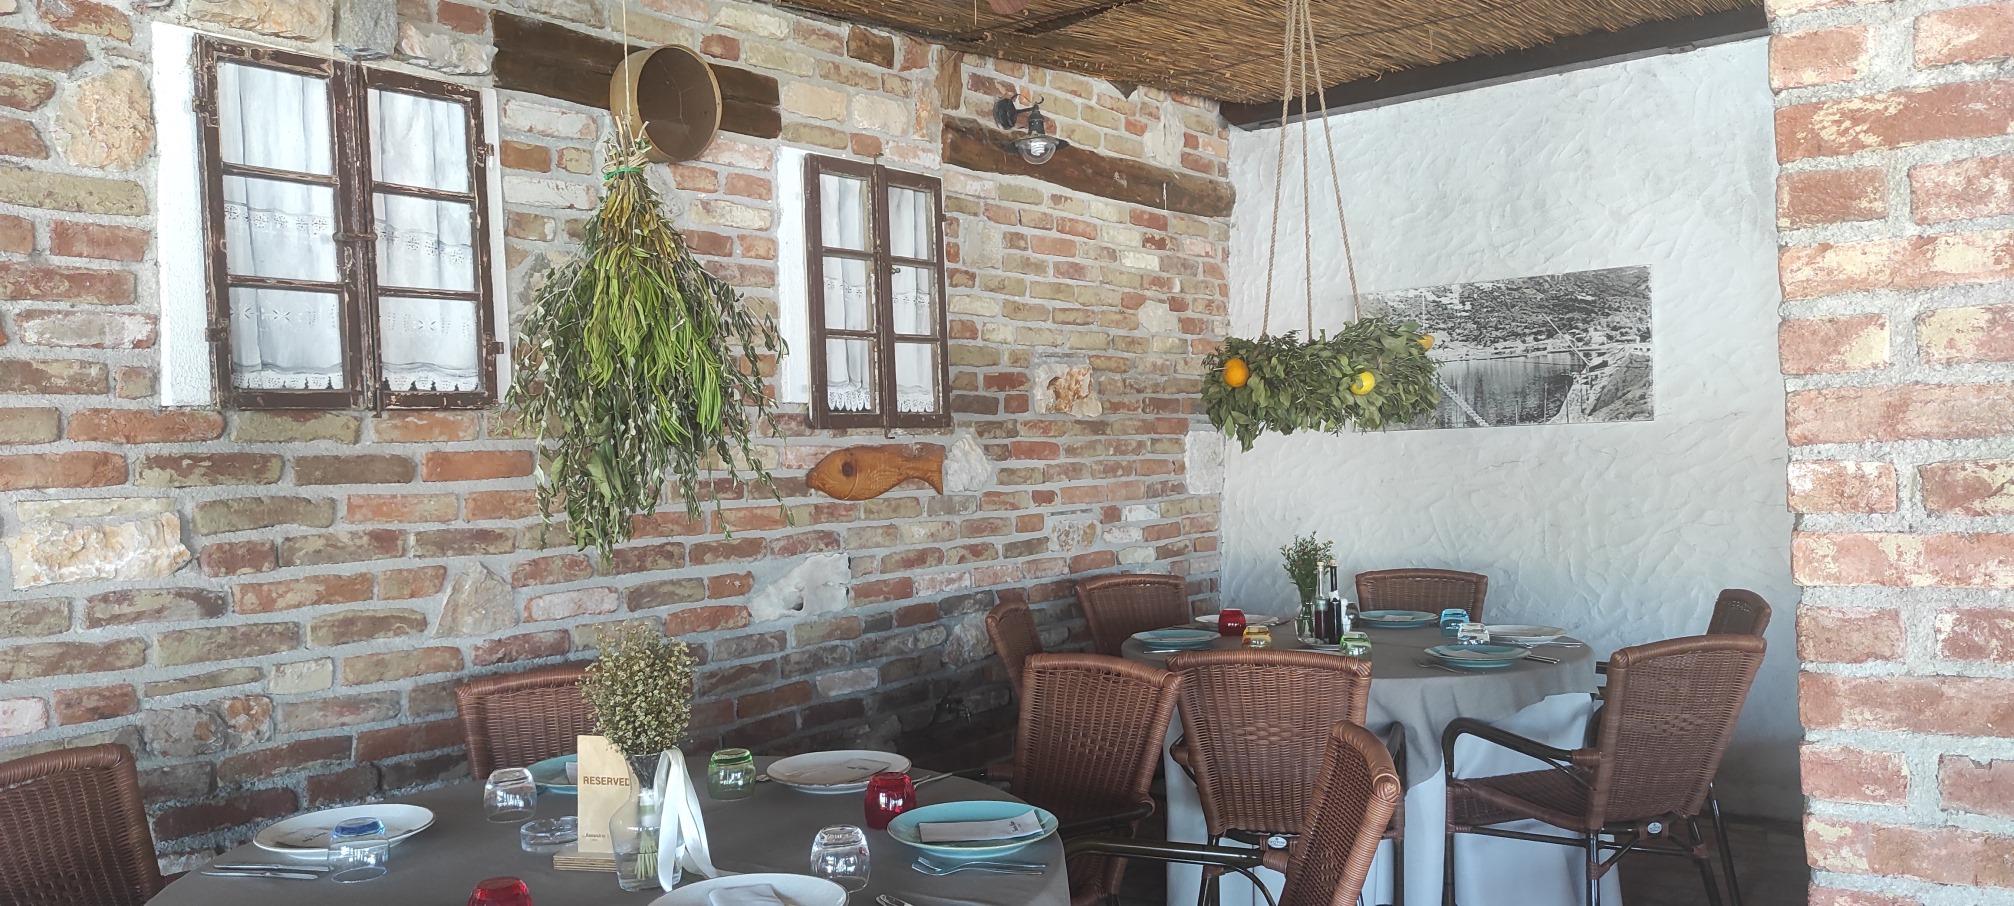 Doma je najljepše: Novi Vinodolski